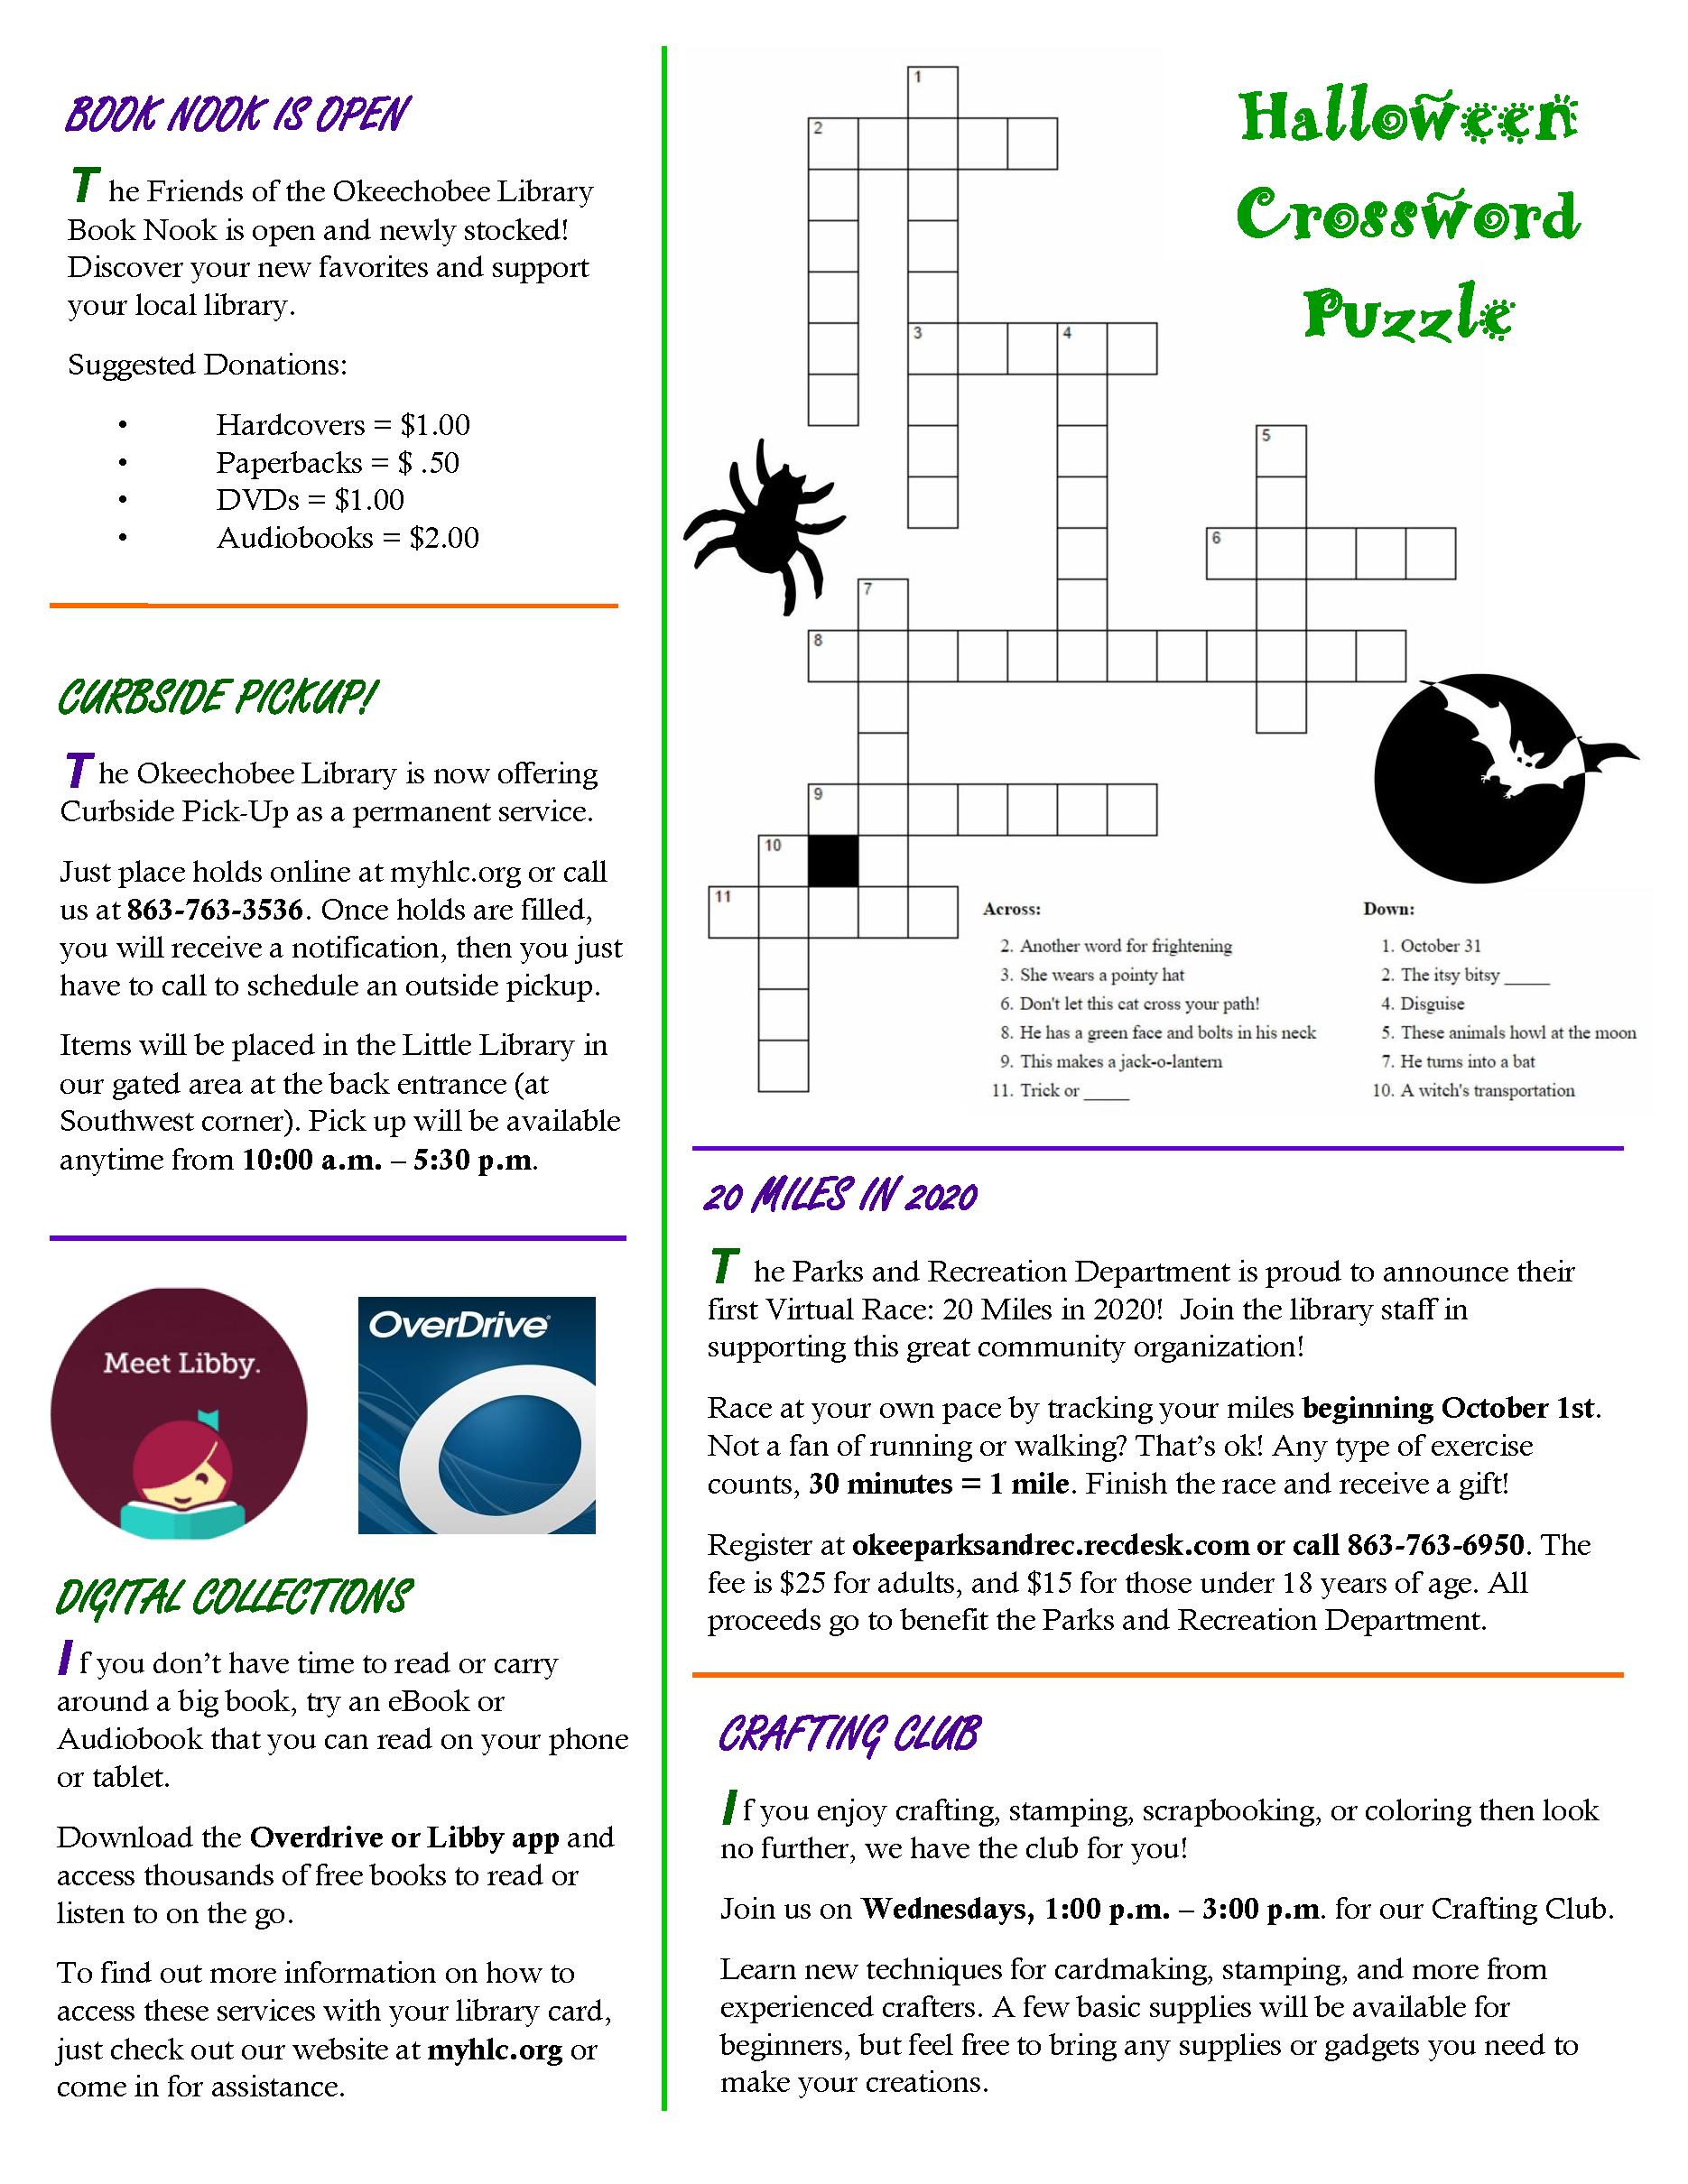 Okeechobee Library September 2020 Newsletter page 3